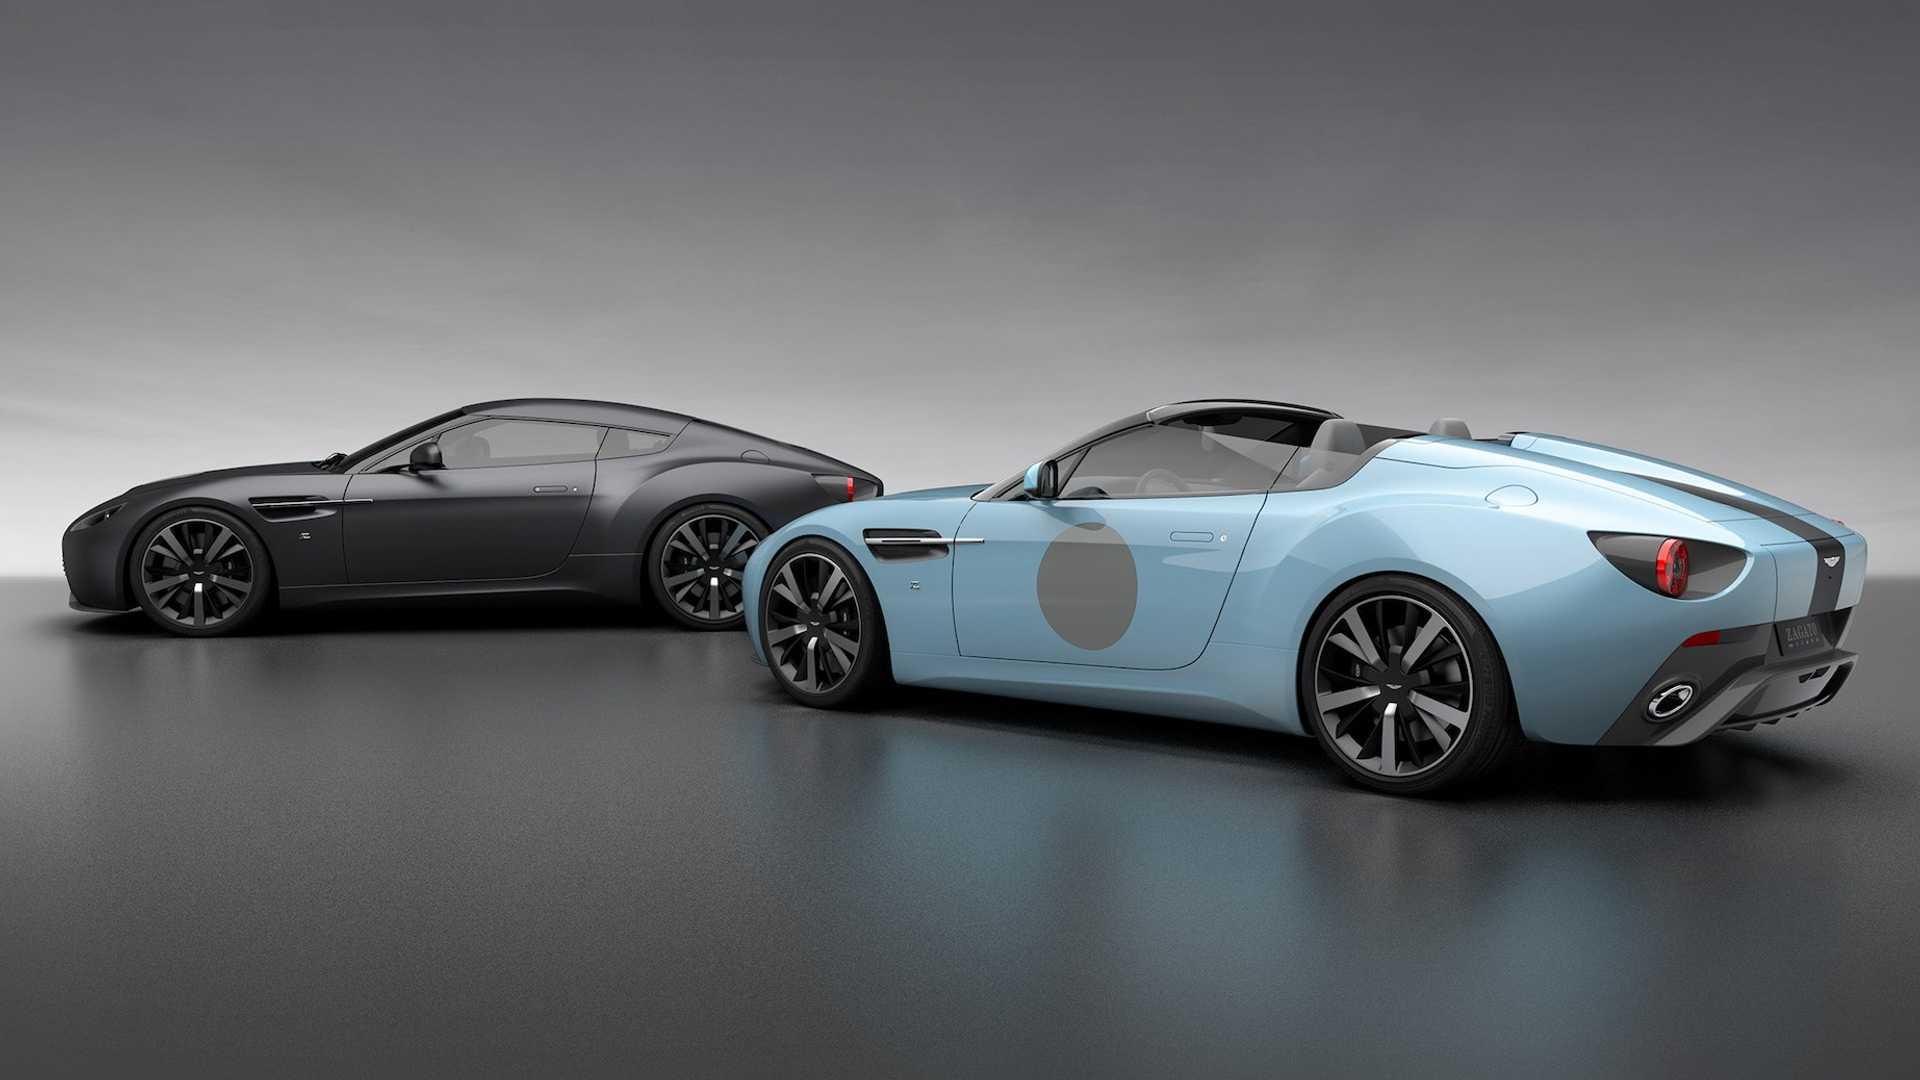 aston-martin-vantage-v12-zagato-heritage-twins-by-r-reforged-1